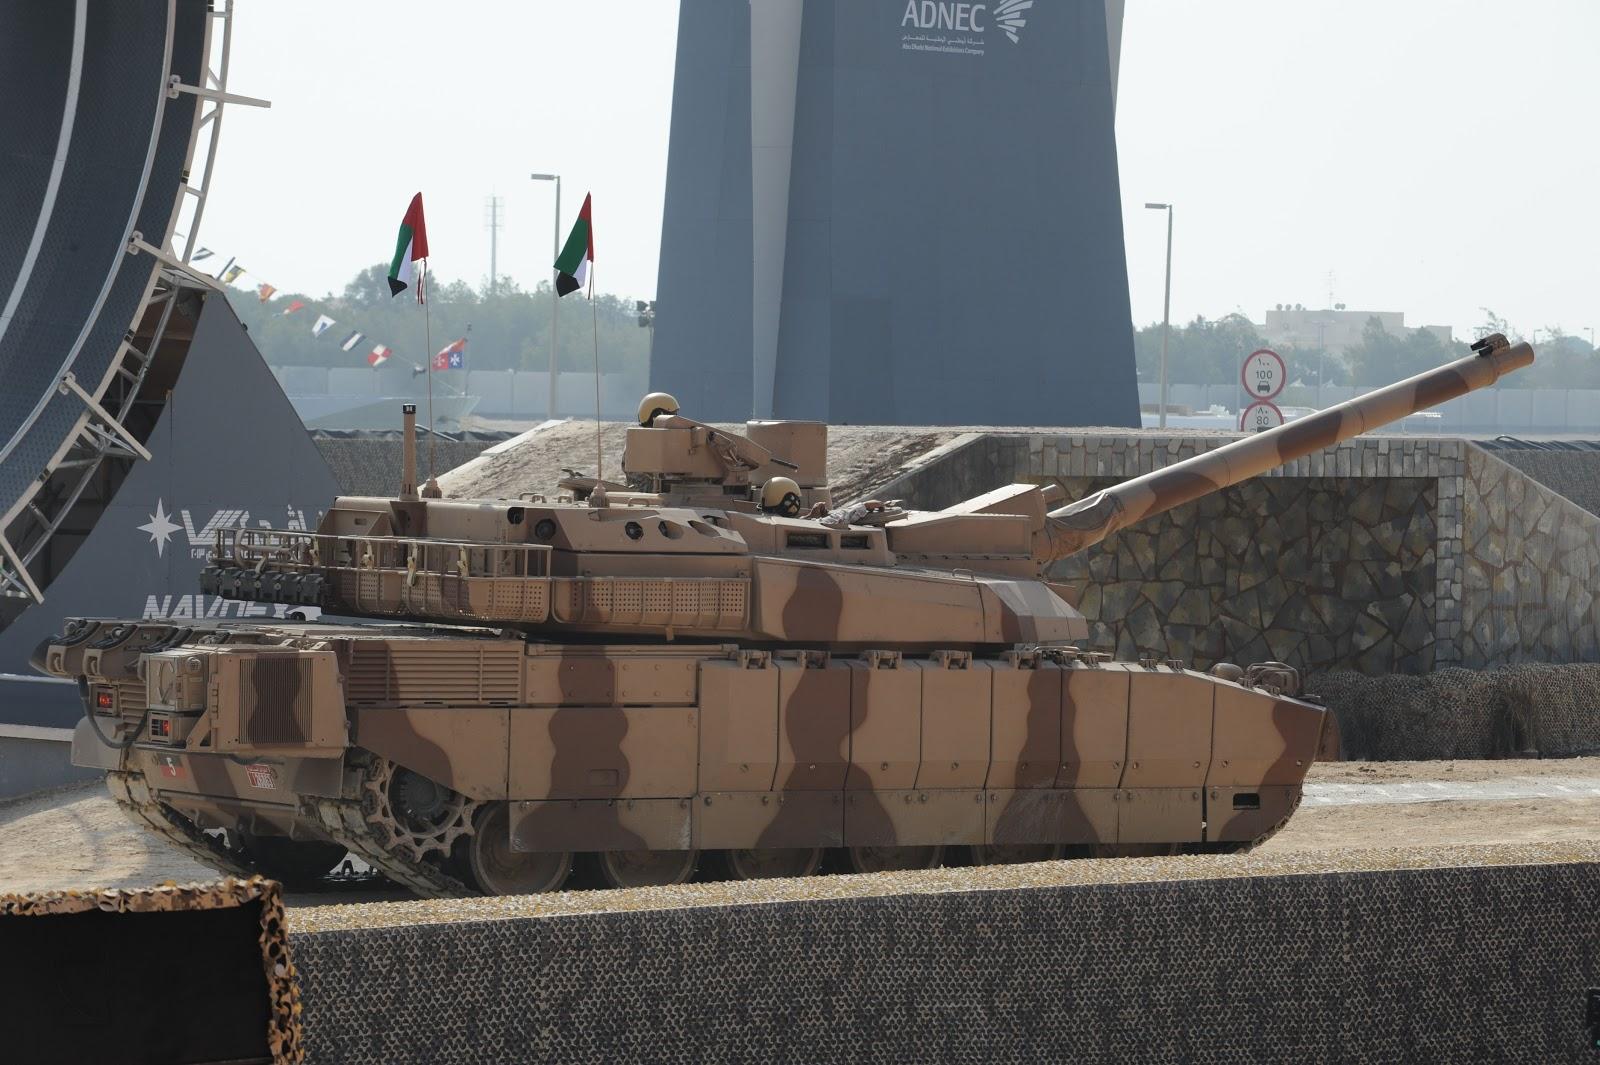 Armée des Emirats Arabe Unis AMX+Leclerc,+is+a+main+battle+tank+(MBT)+army+of+the+United+Arab+Emirates.+Leclerc+used+by+the+Army+Forces+of+United+Arab+Emirates.++(2)